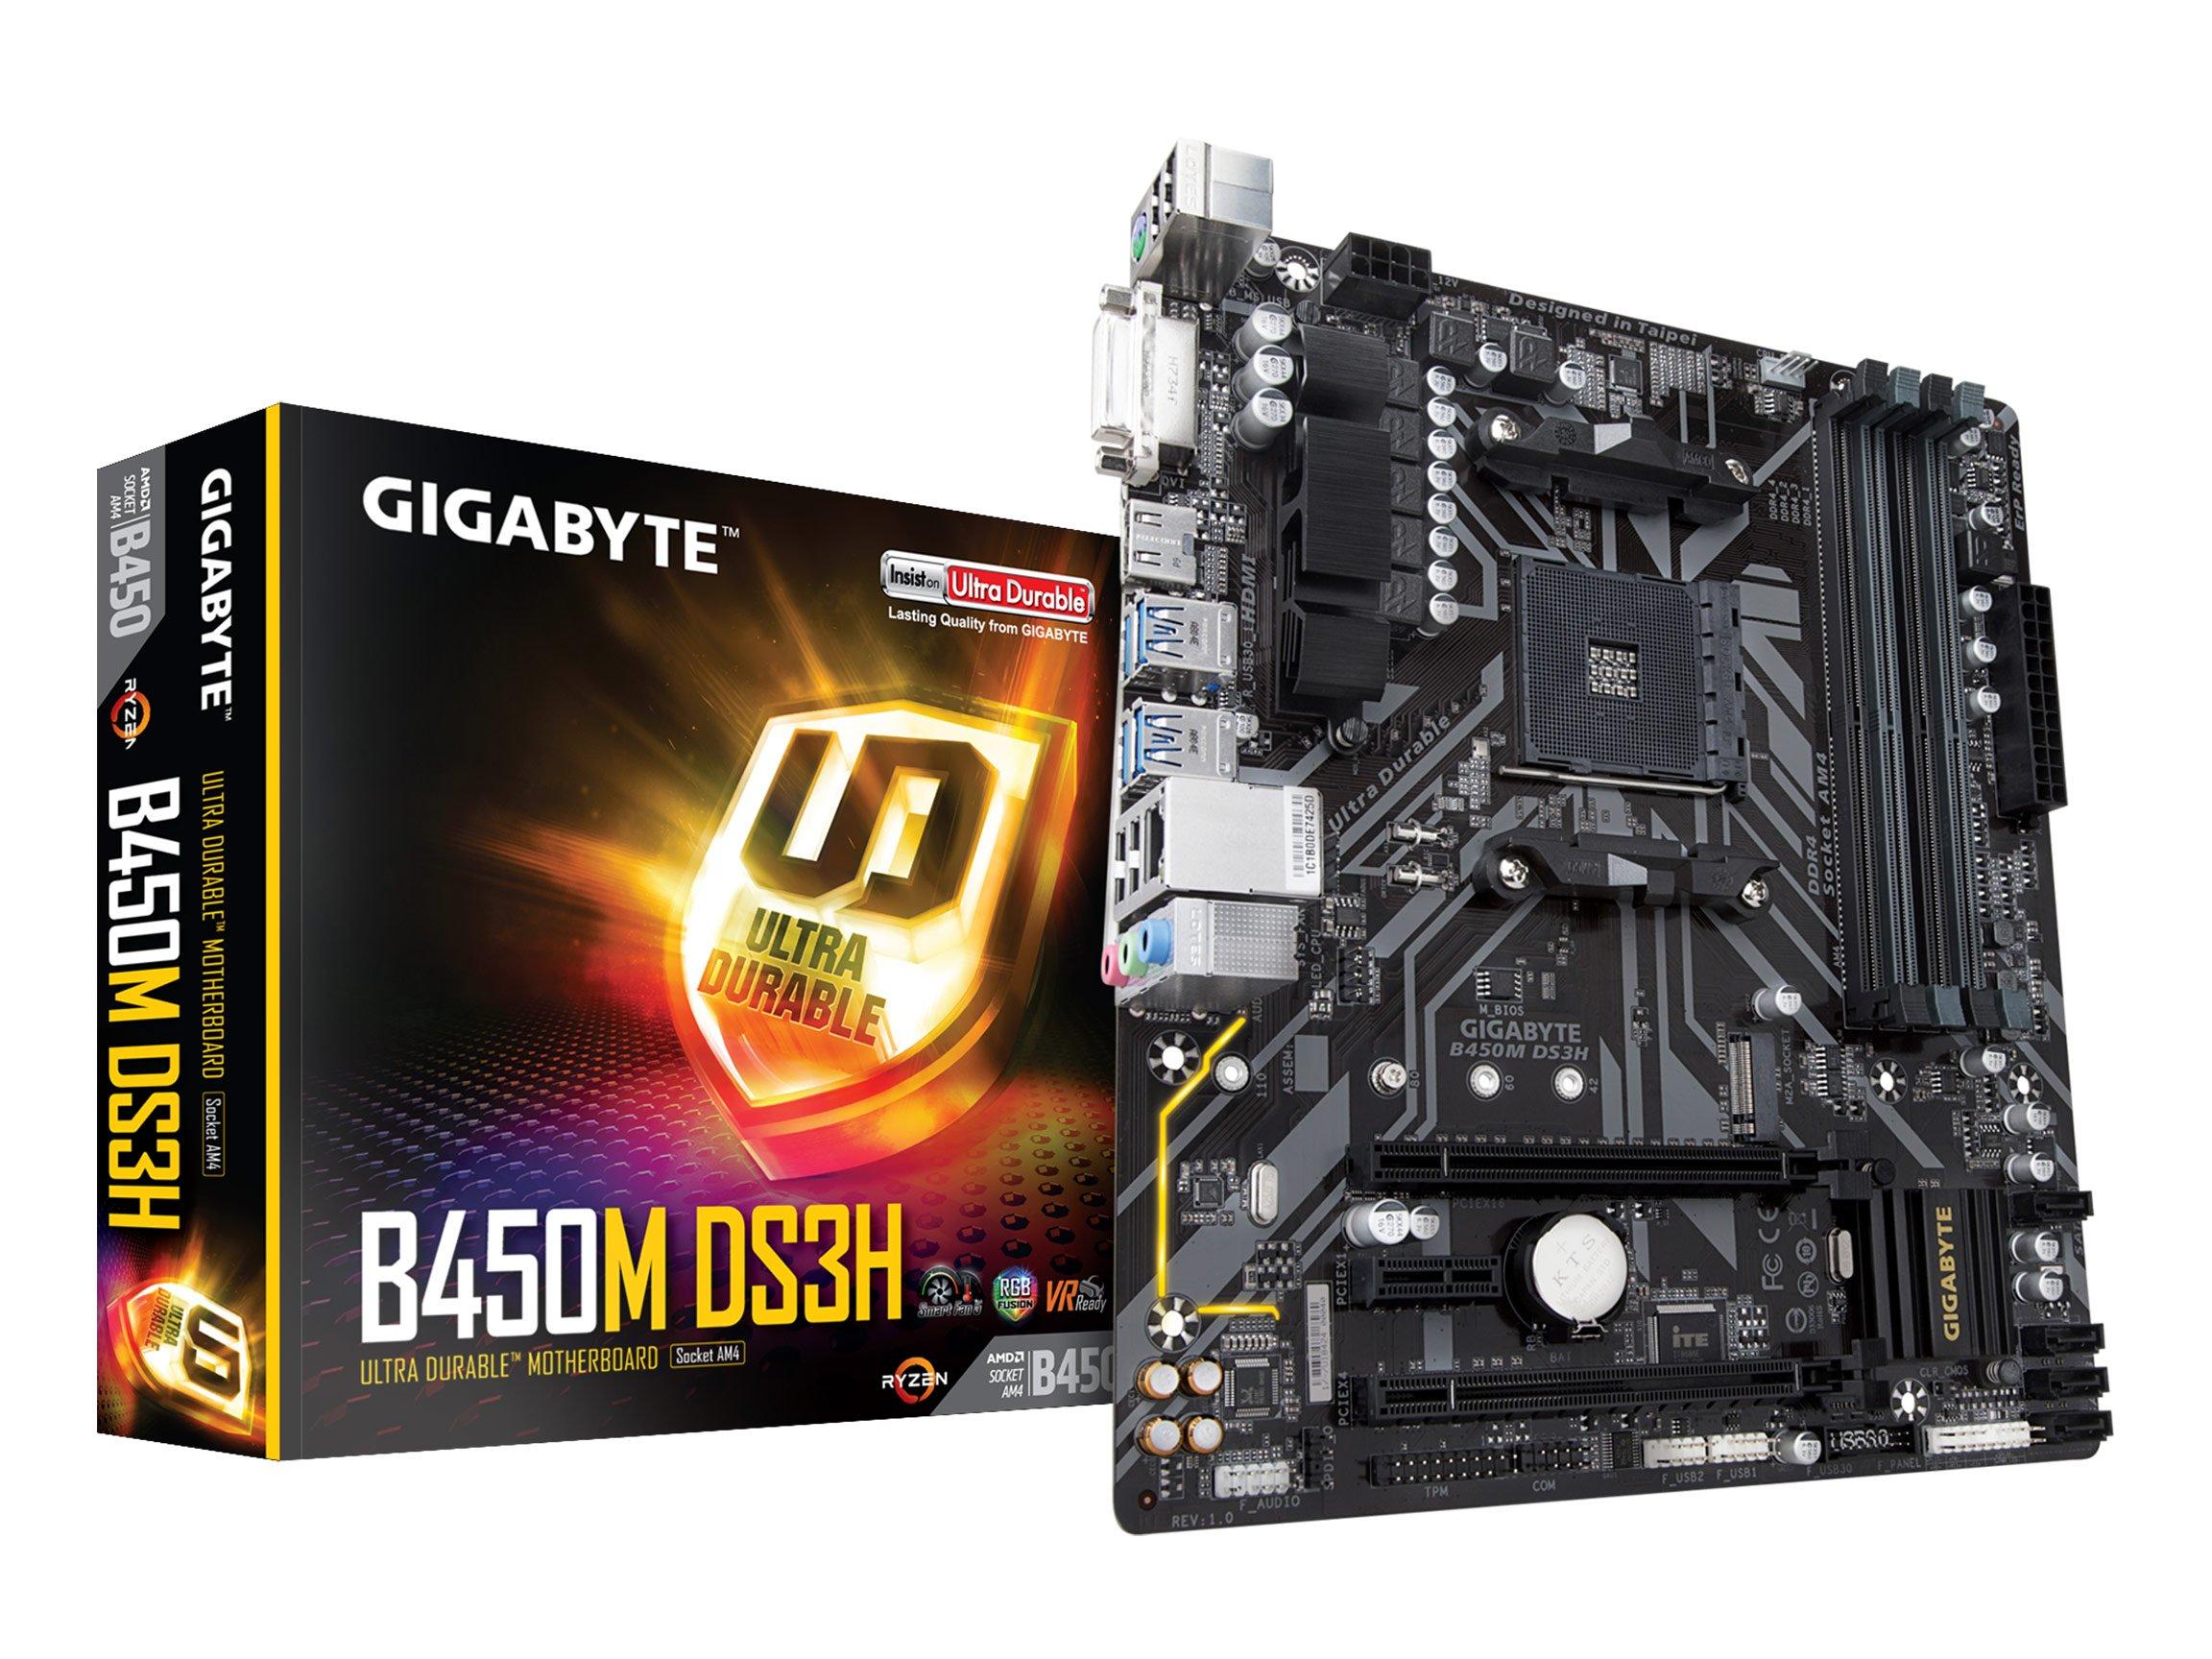 GIGABYTE B450M DS3H (AMD Ryzen AM4/M.2/HMDI/DVI/USB 3.1/DDR4/Micro ATX/Motherboard) by Gigabyte